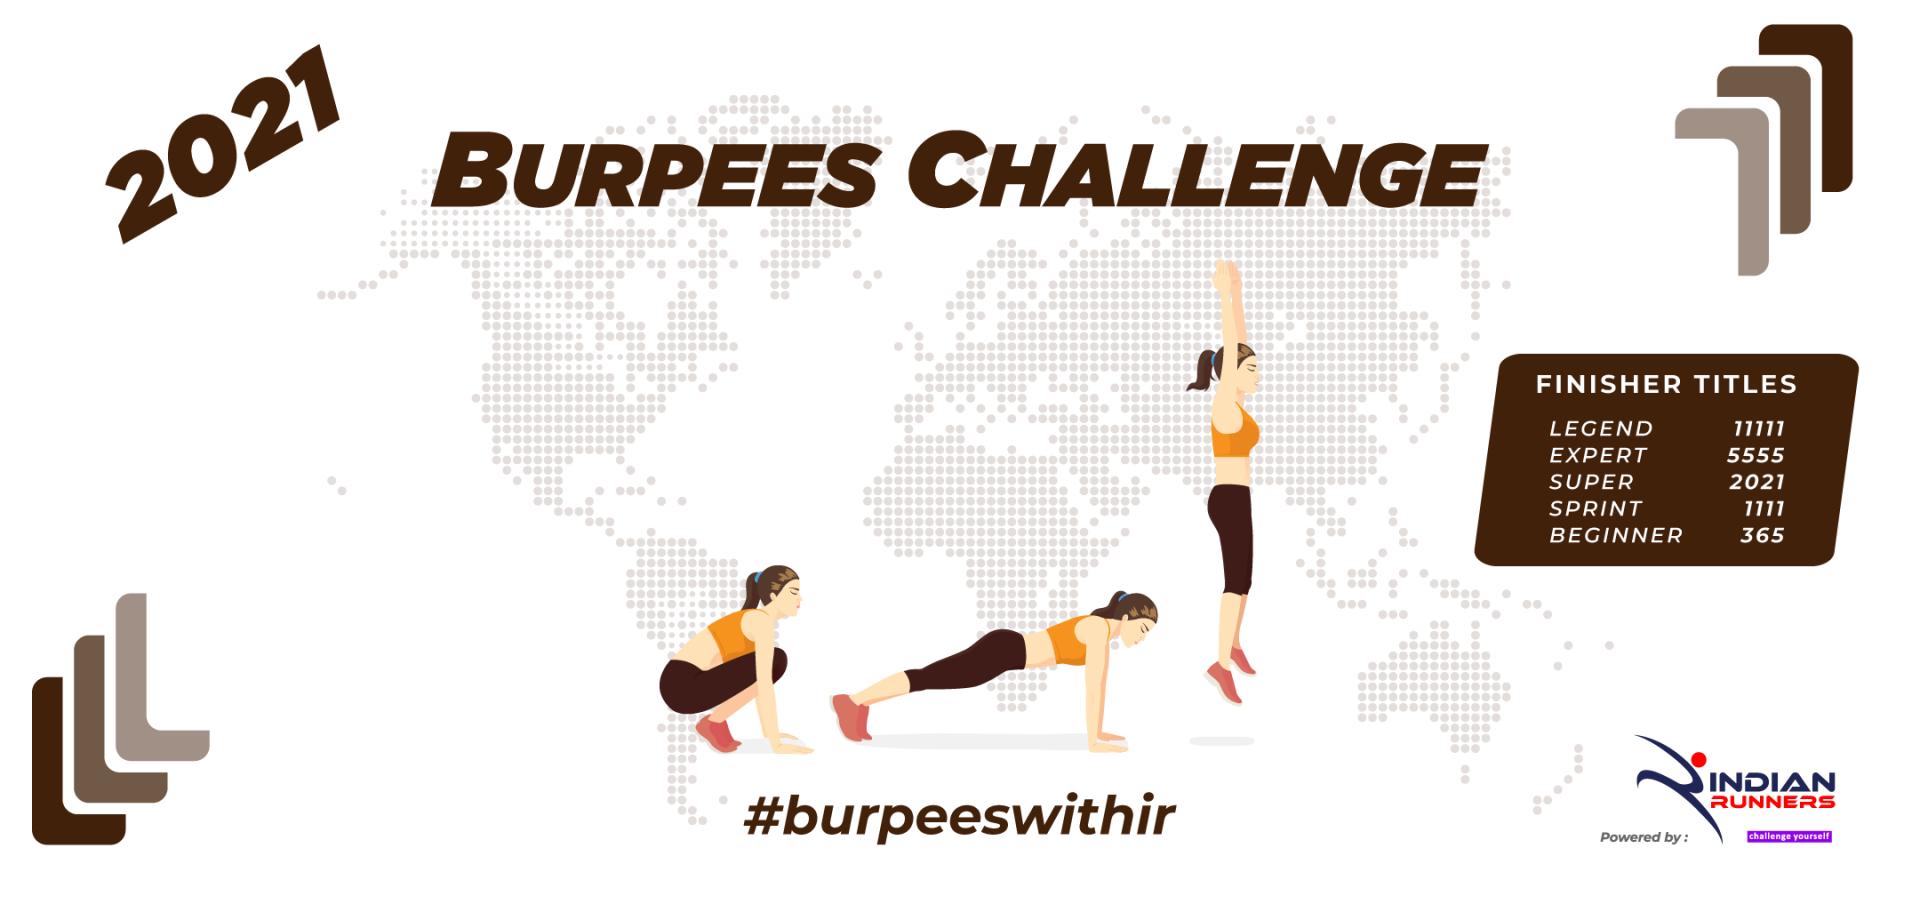 Burpees Challenge 2021 image